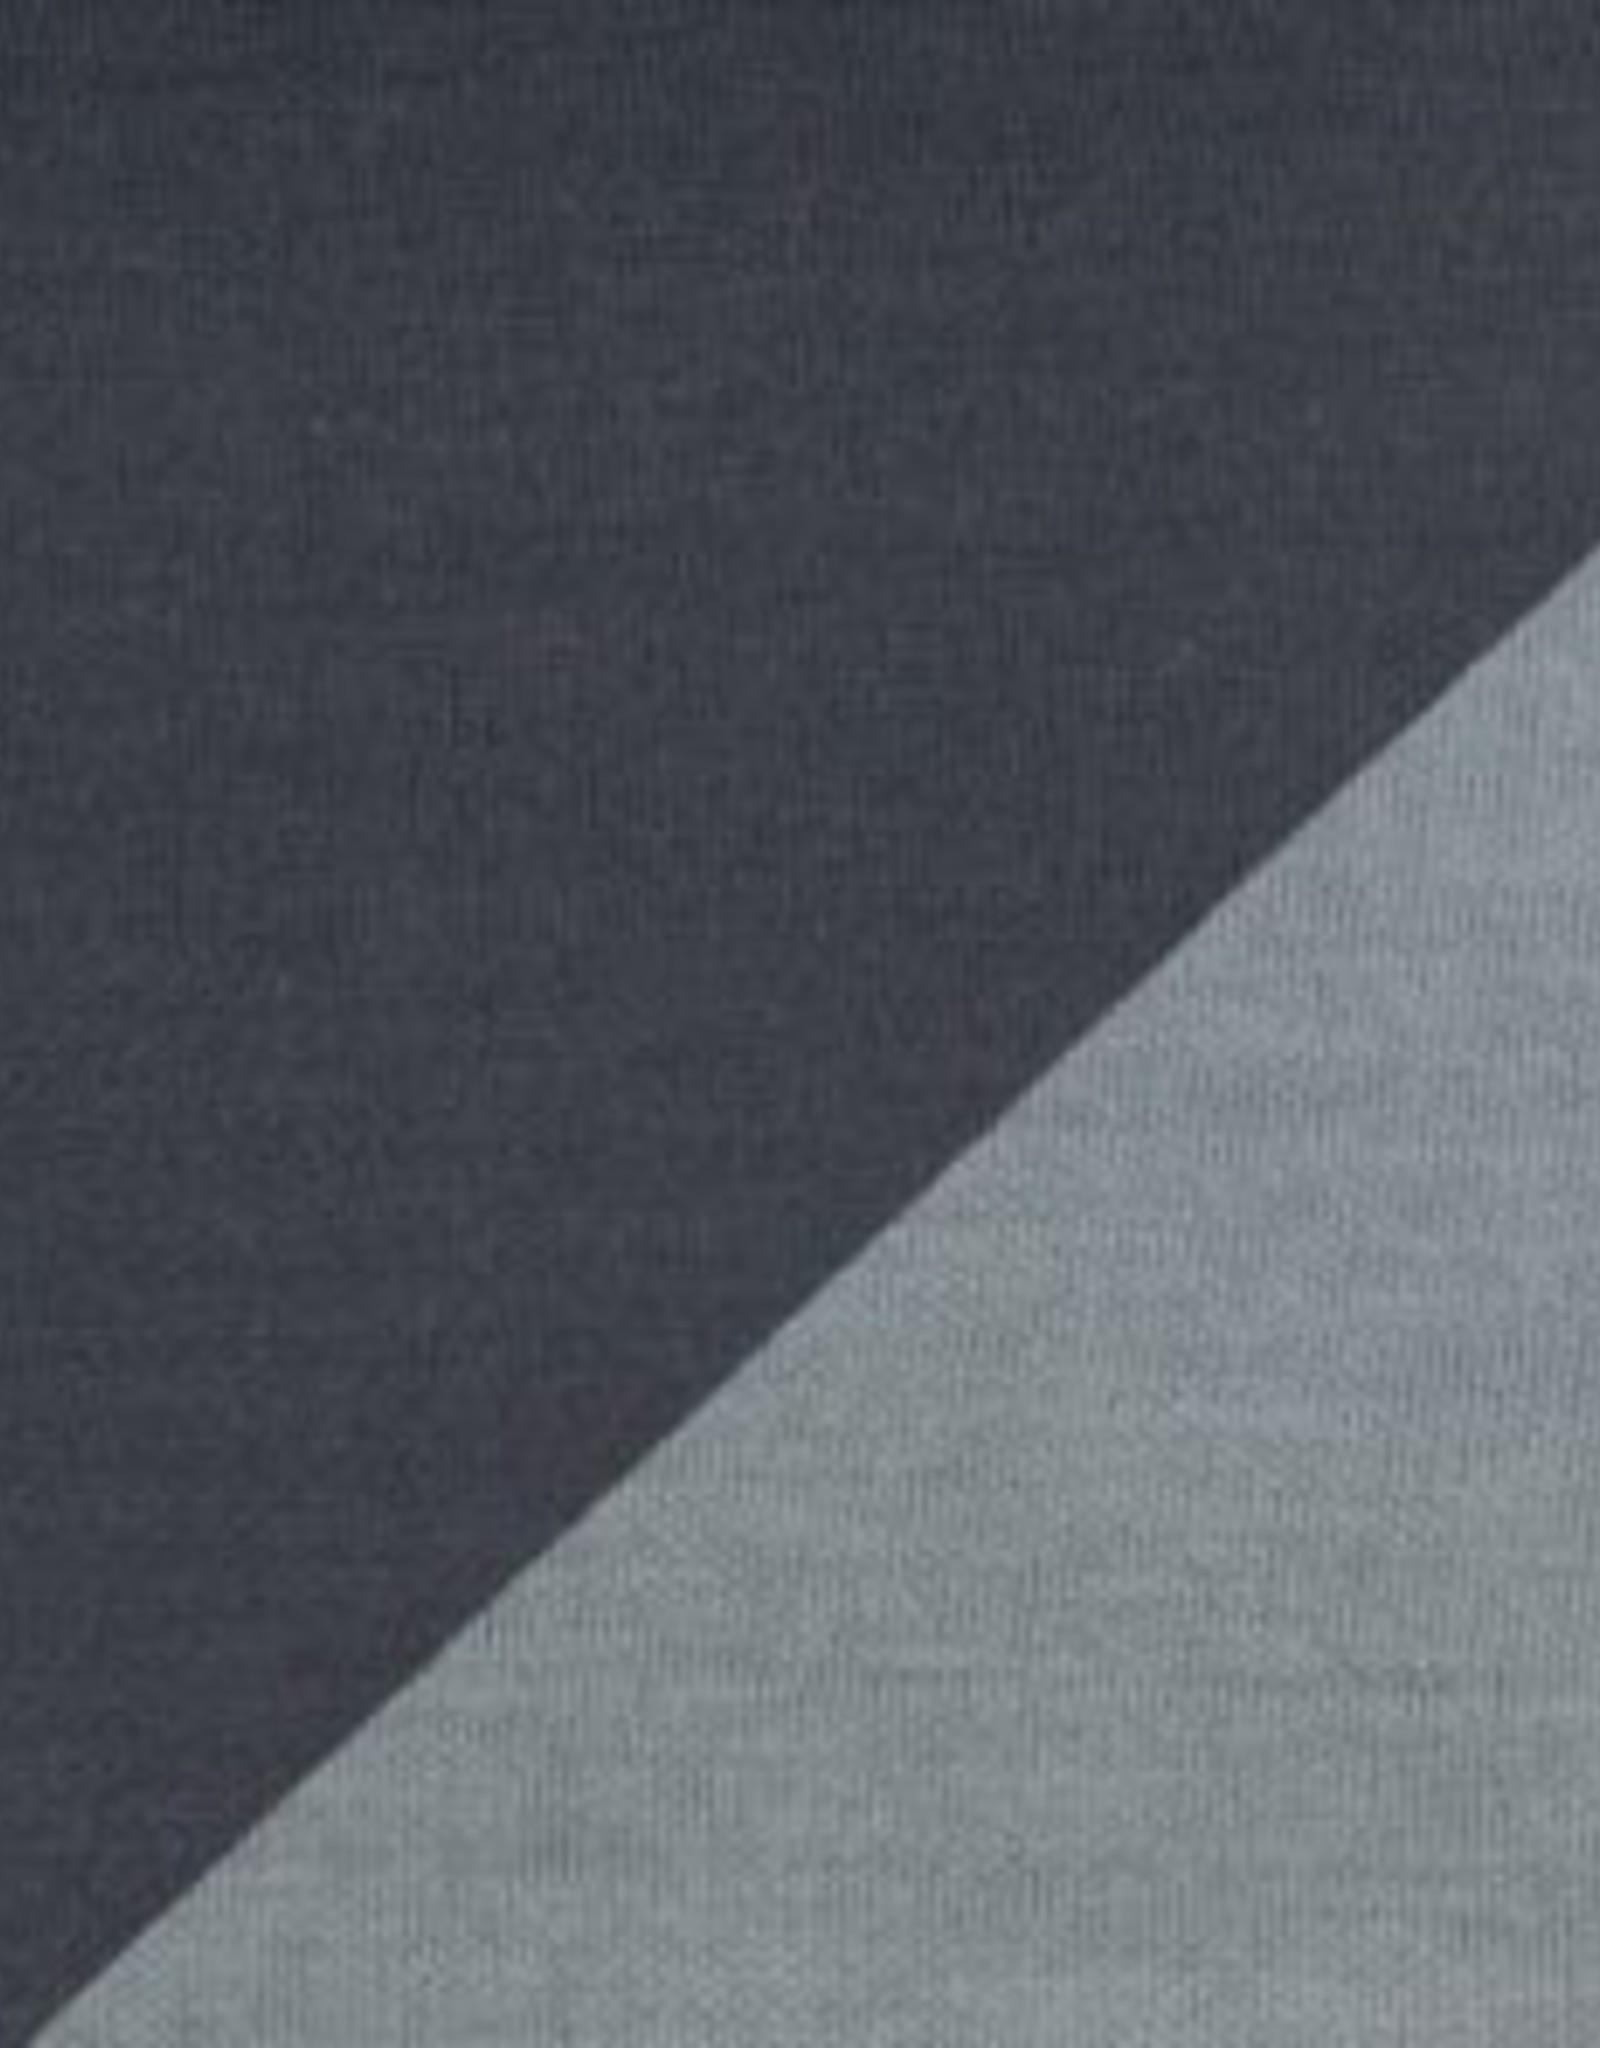 swafing coupon Ida double face viscosetricot ijsblauw/blauwgrijs135x110cm